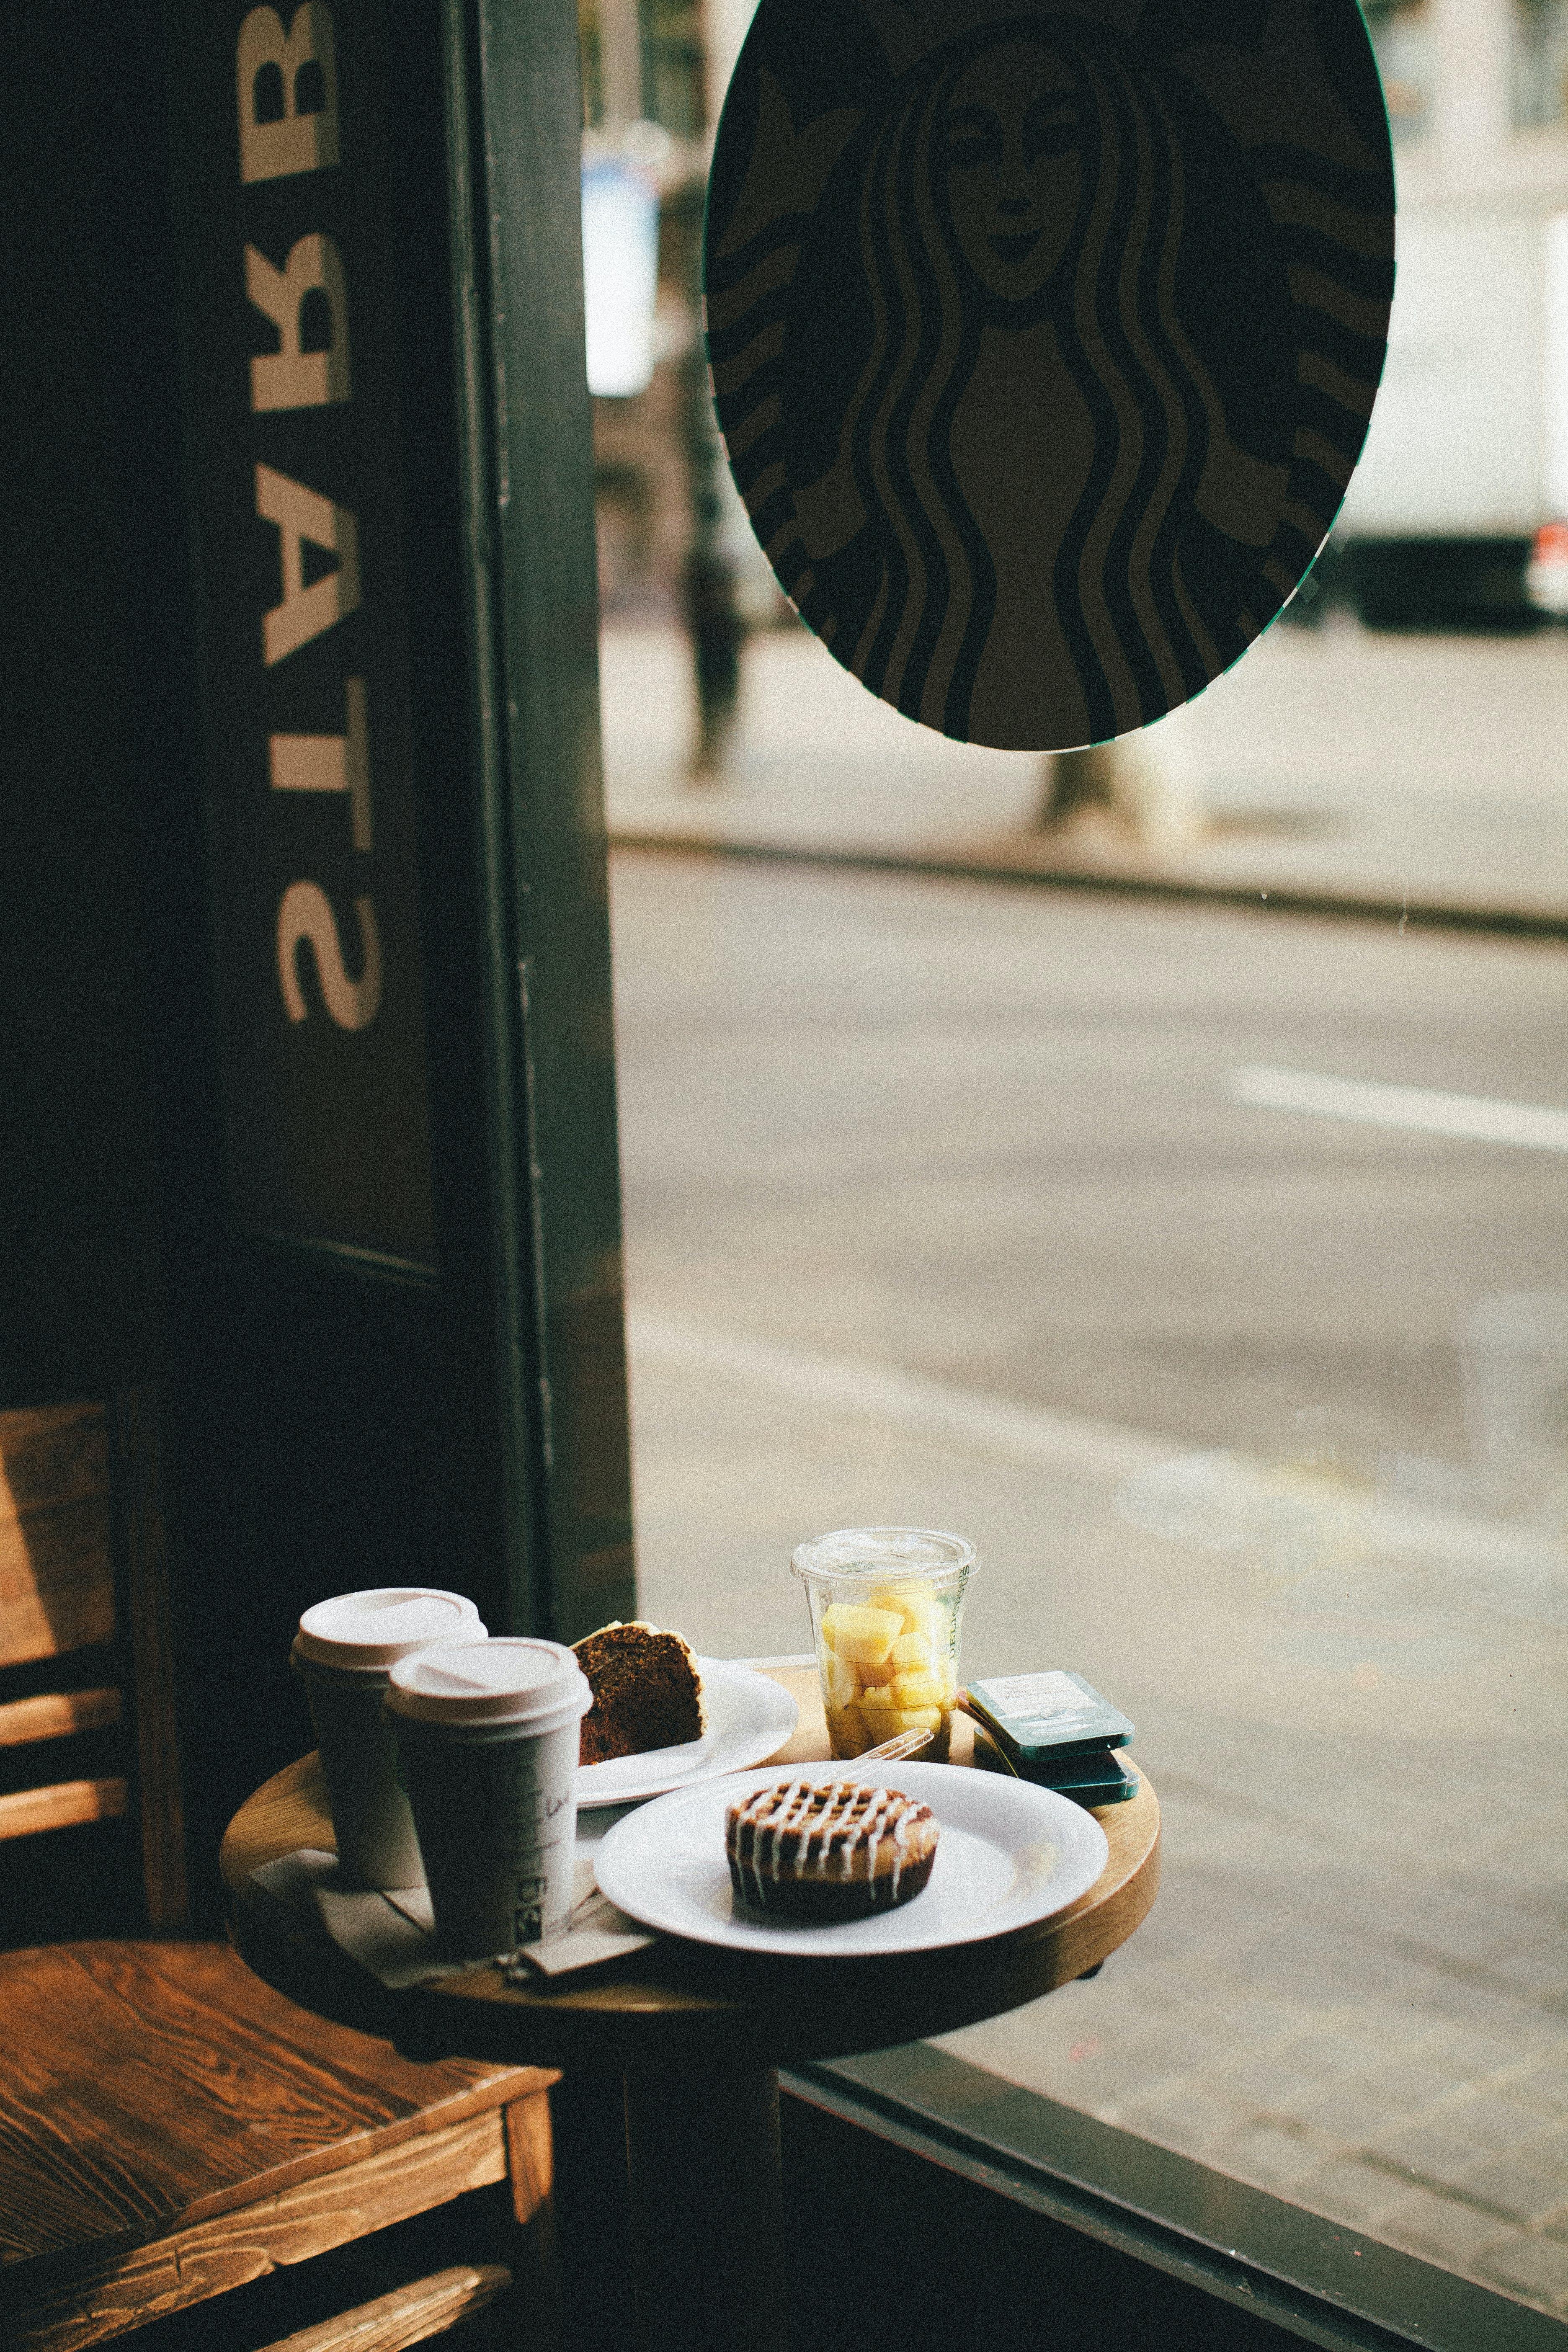 Food And Drinks At Starbucks